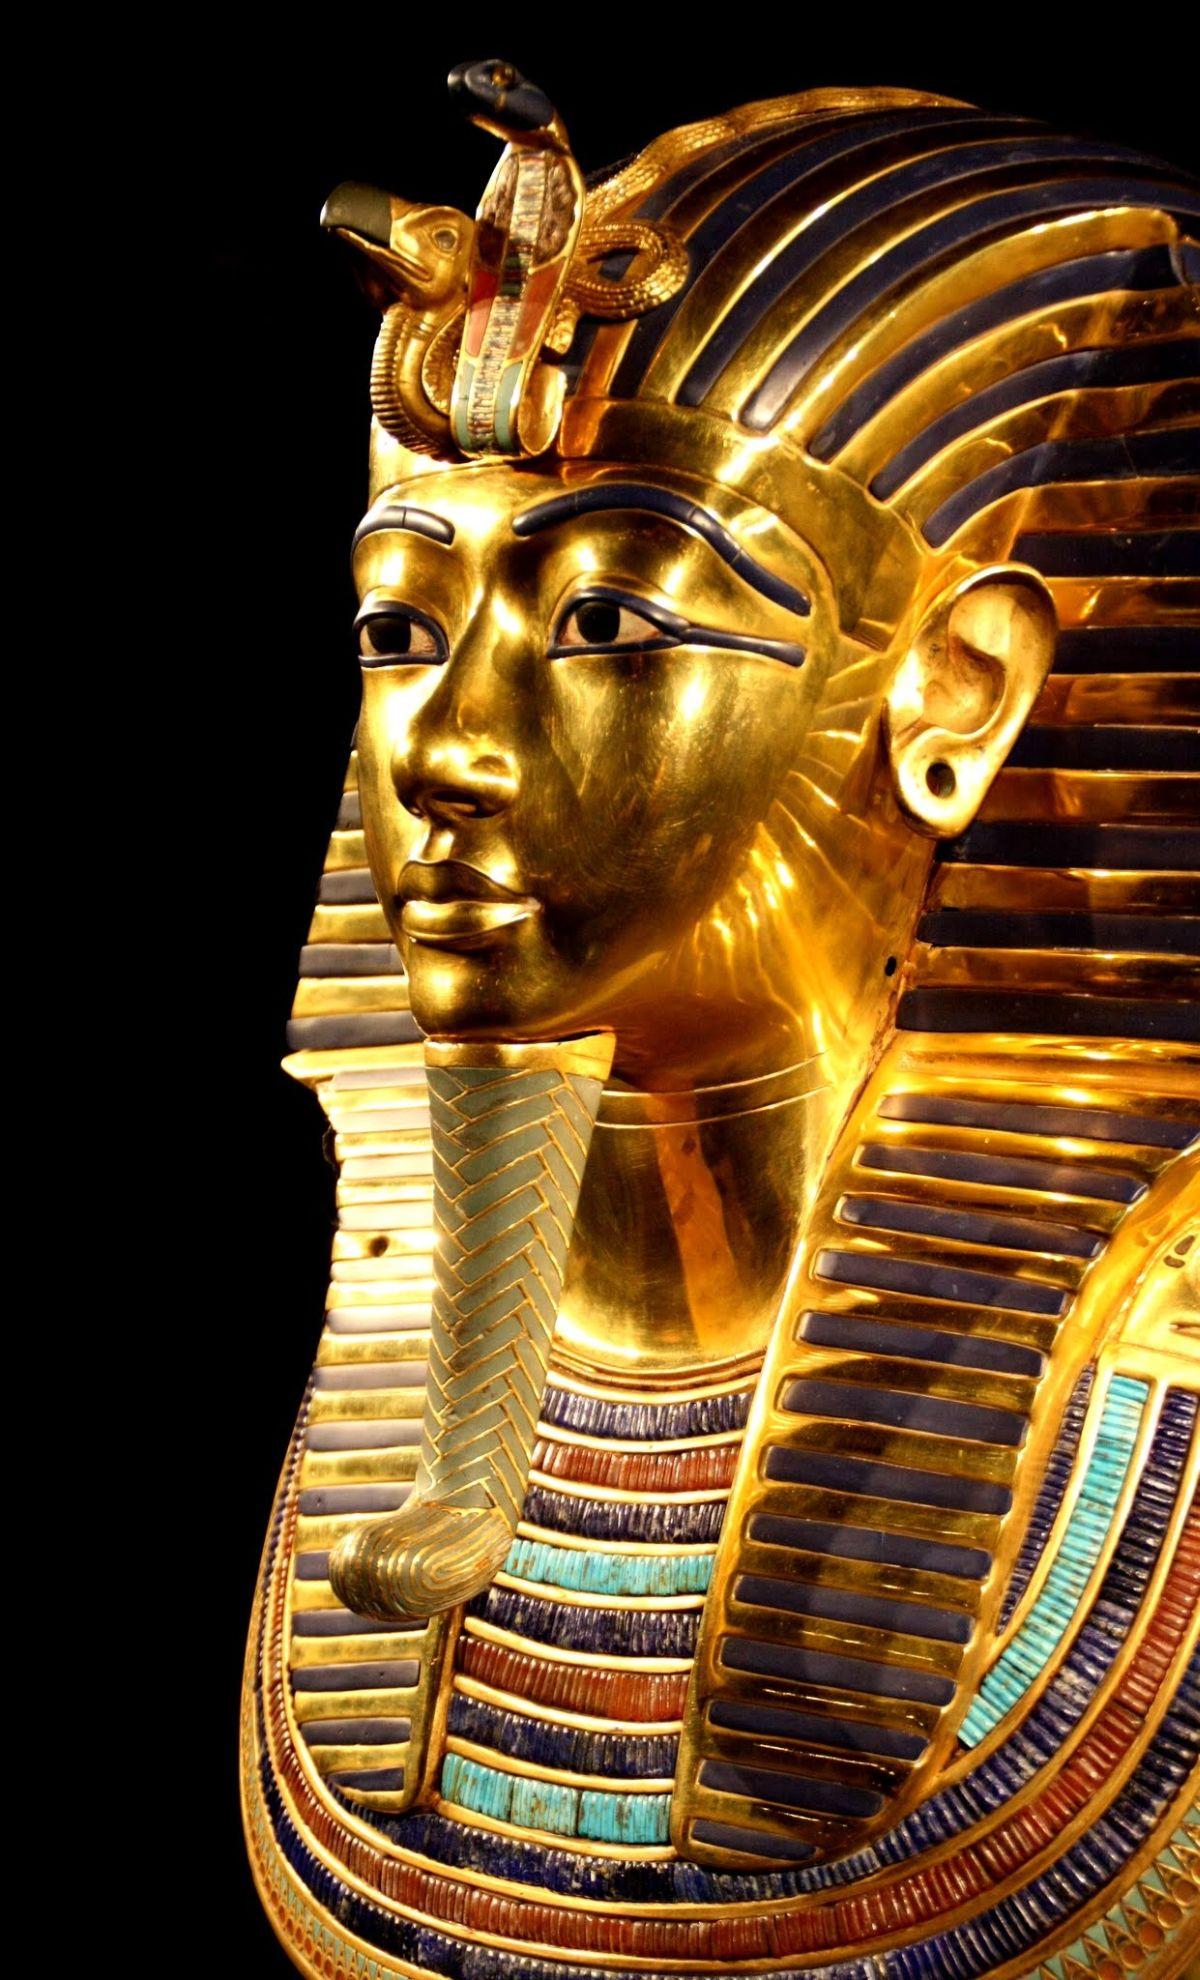 OŠTEĆENA LEGENDARNA MASKA TUTANKAMONA Osam zaposlenika muzeja u Kairu na sudu zbog nemara